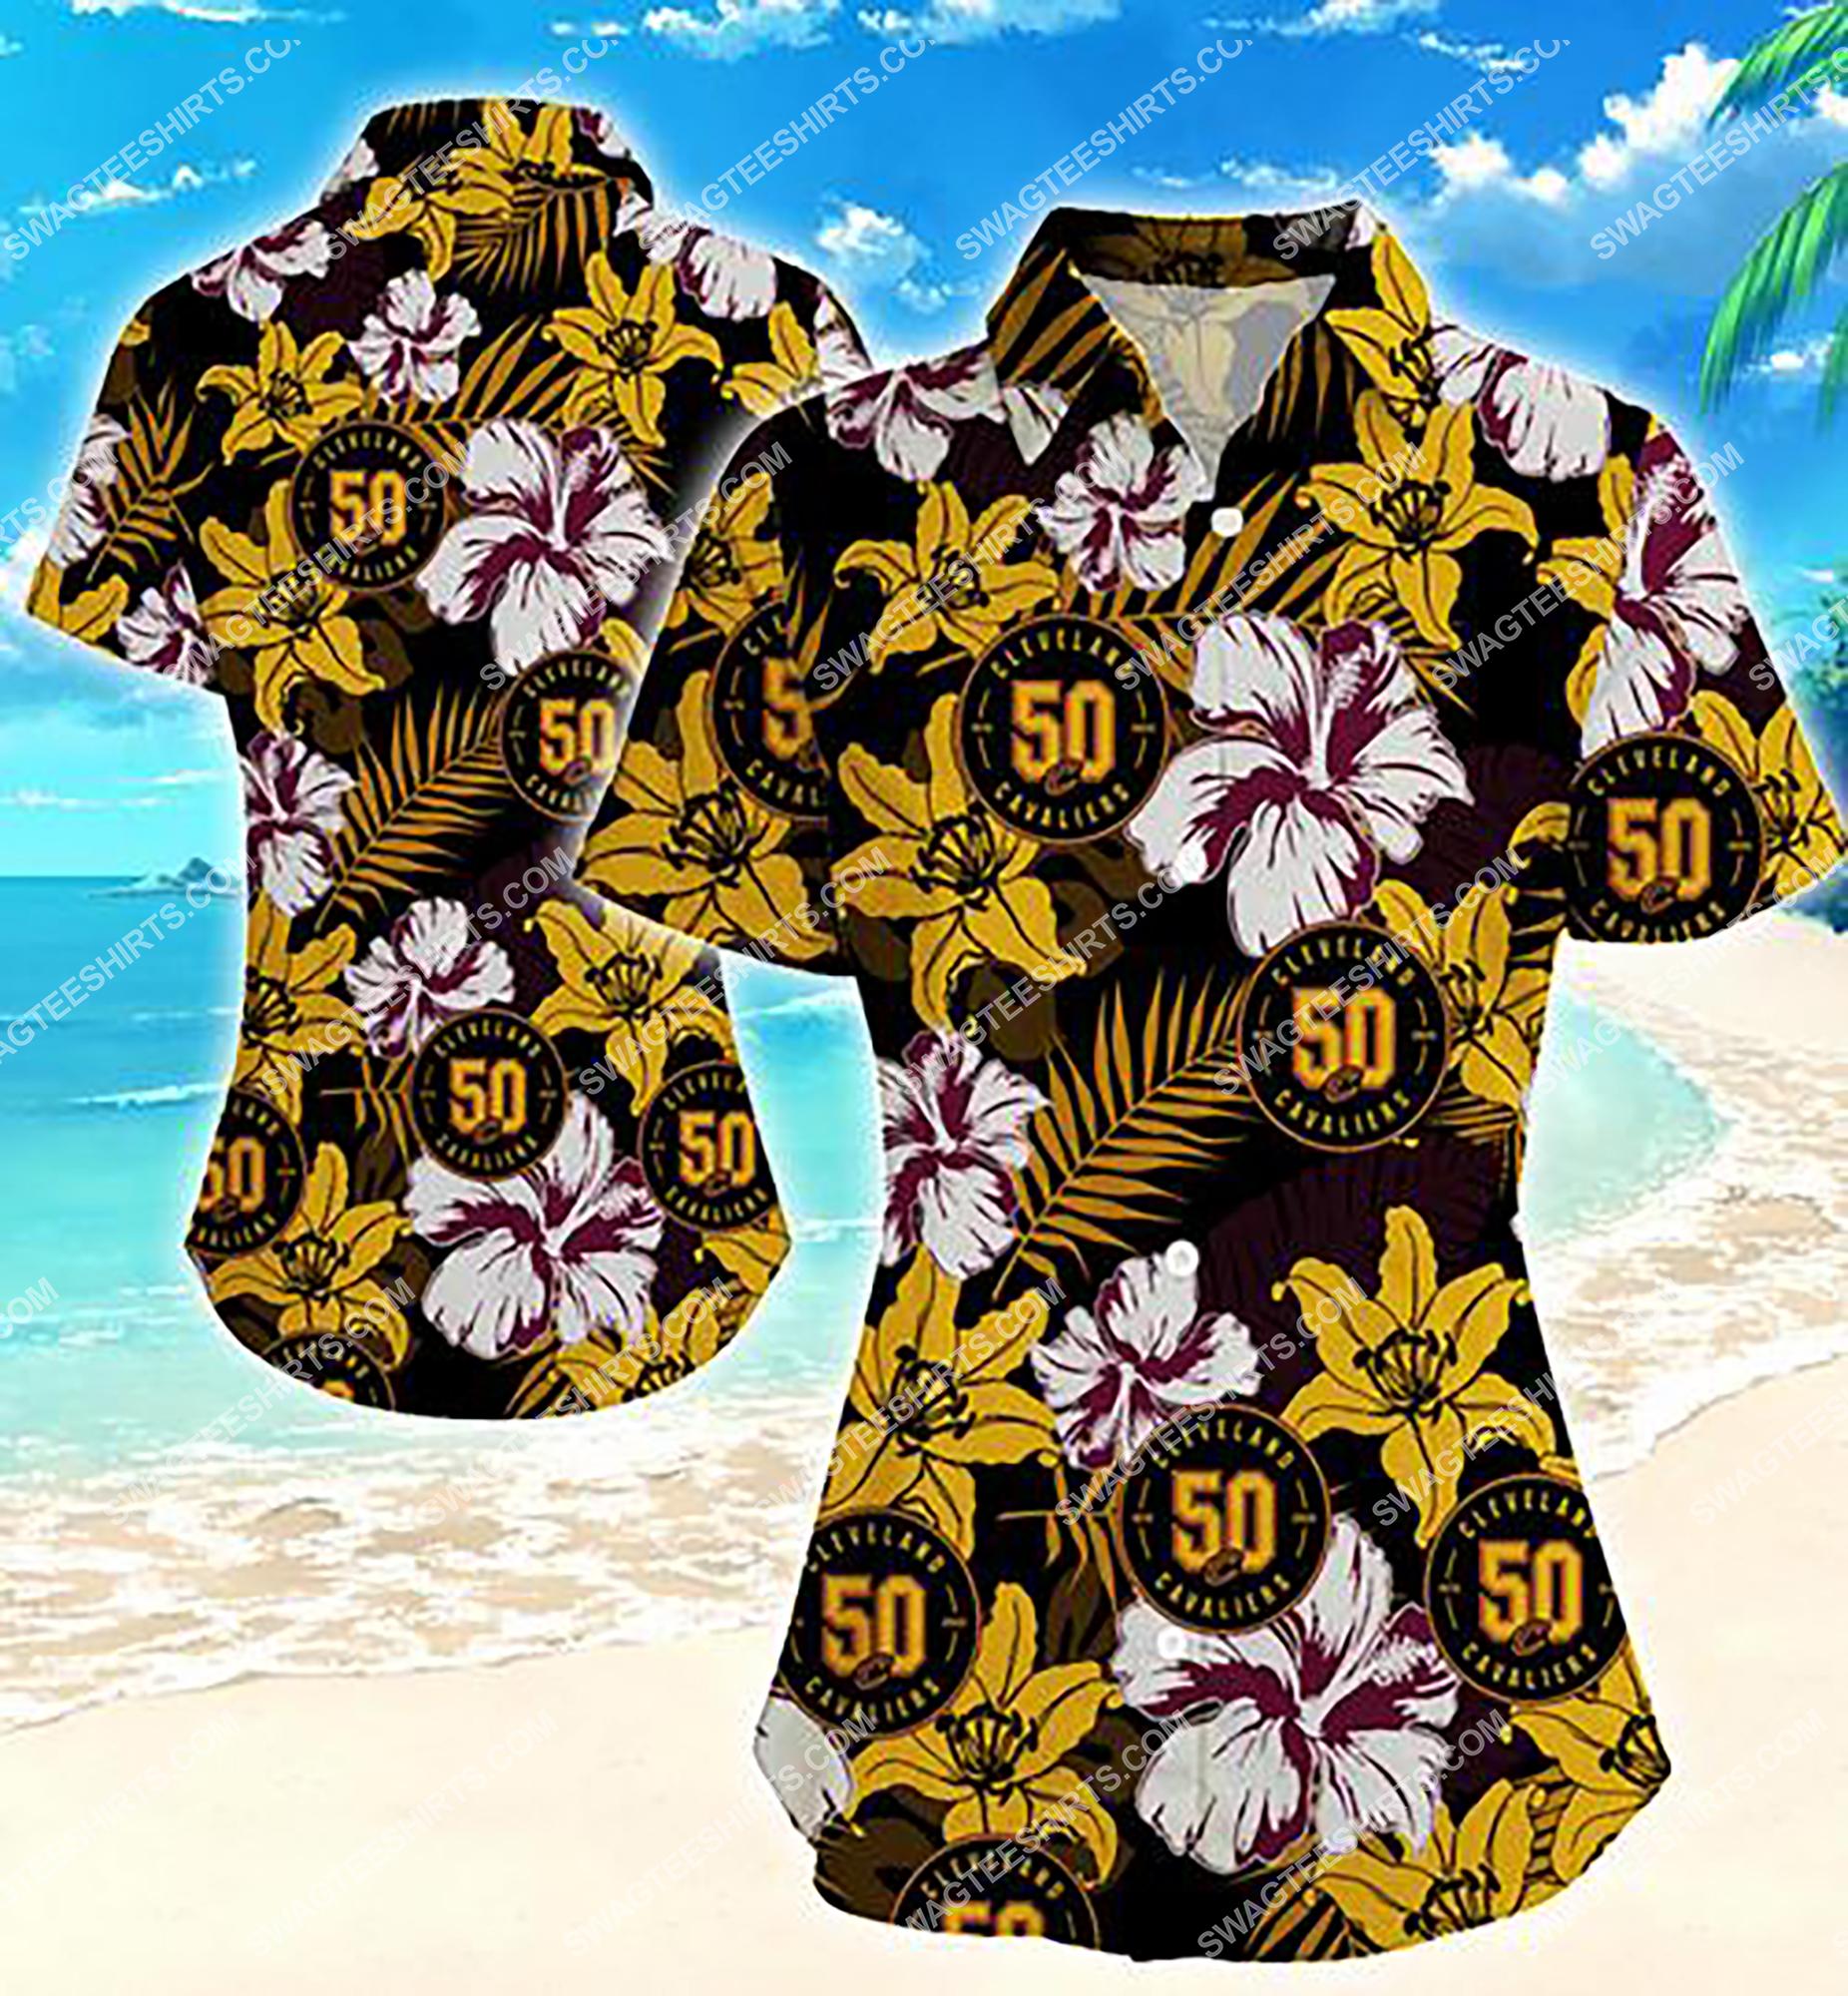 national basketball association cleveland cavaliers team hawaiian shirt 2 - Copy